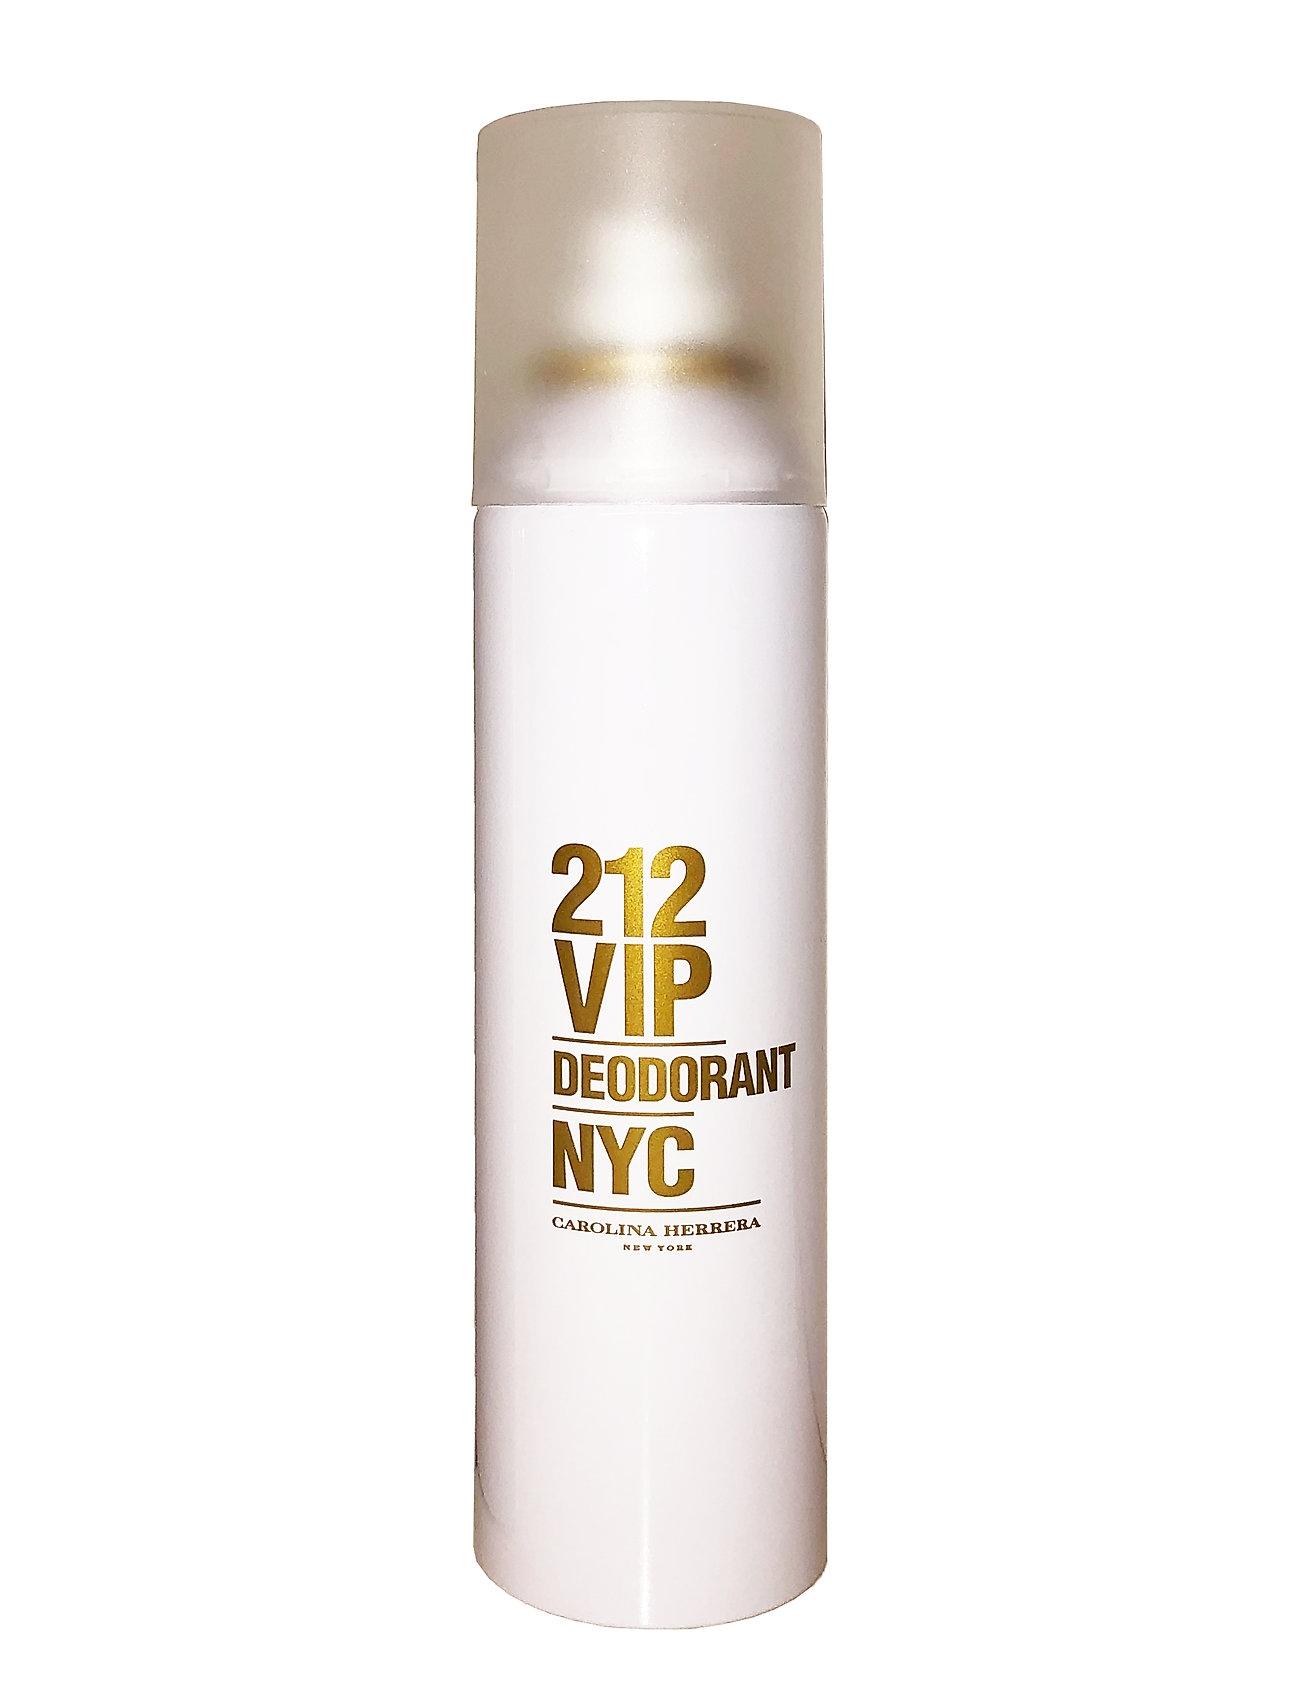 Carolina Herrera 212 VIP dezodorant w sprayu dla kobiet 150ml